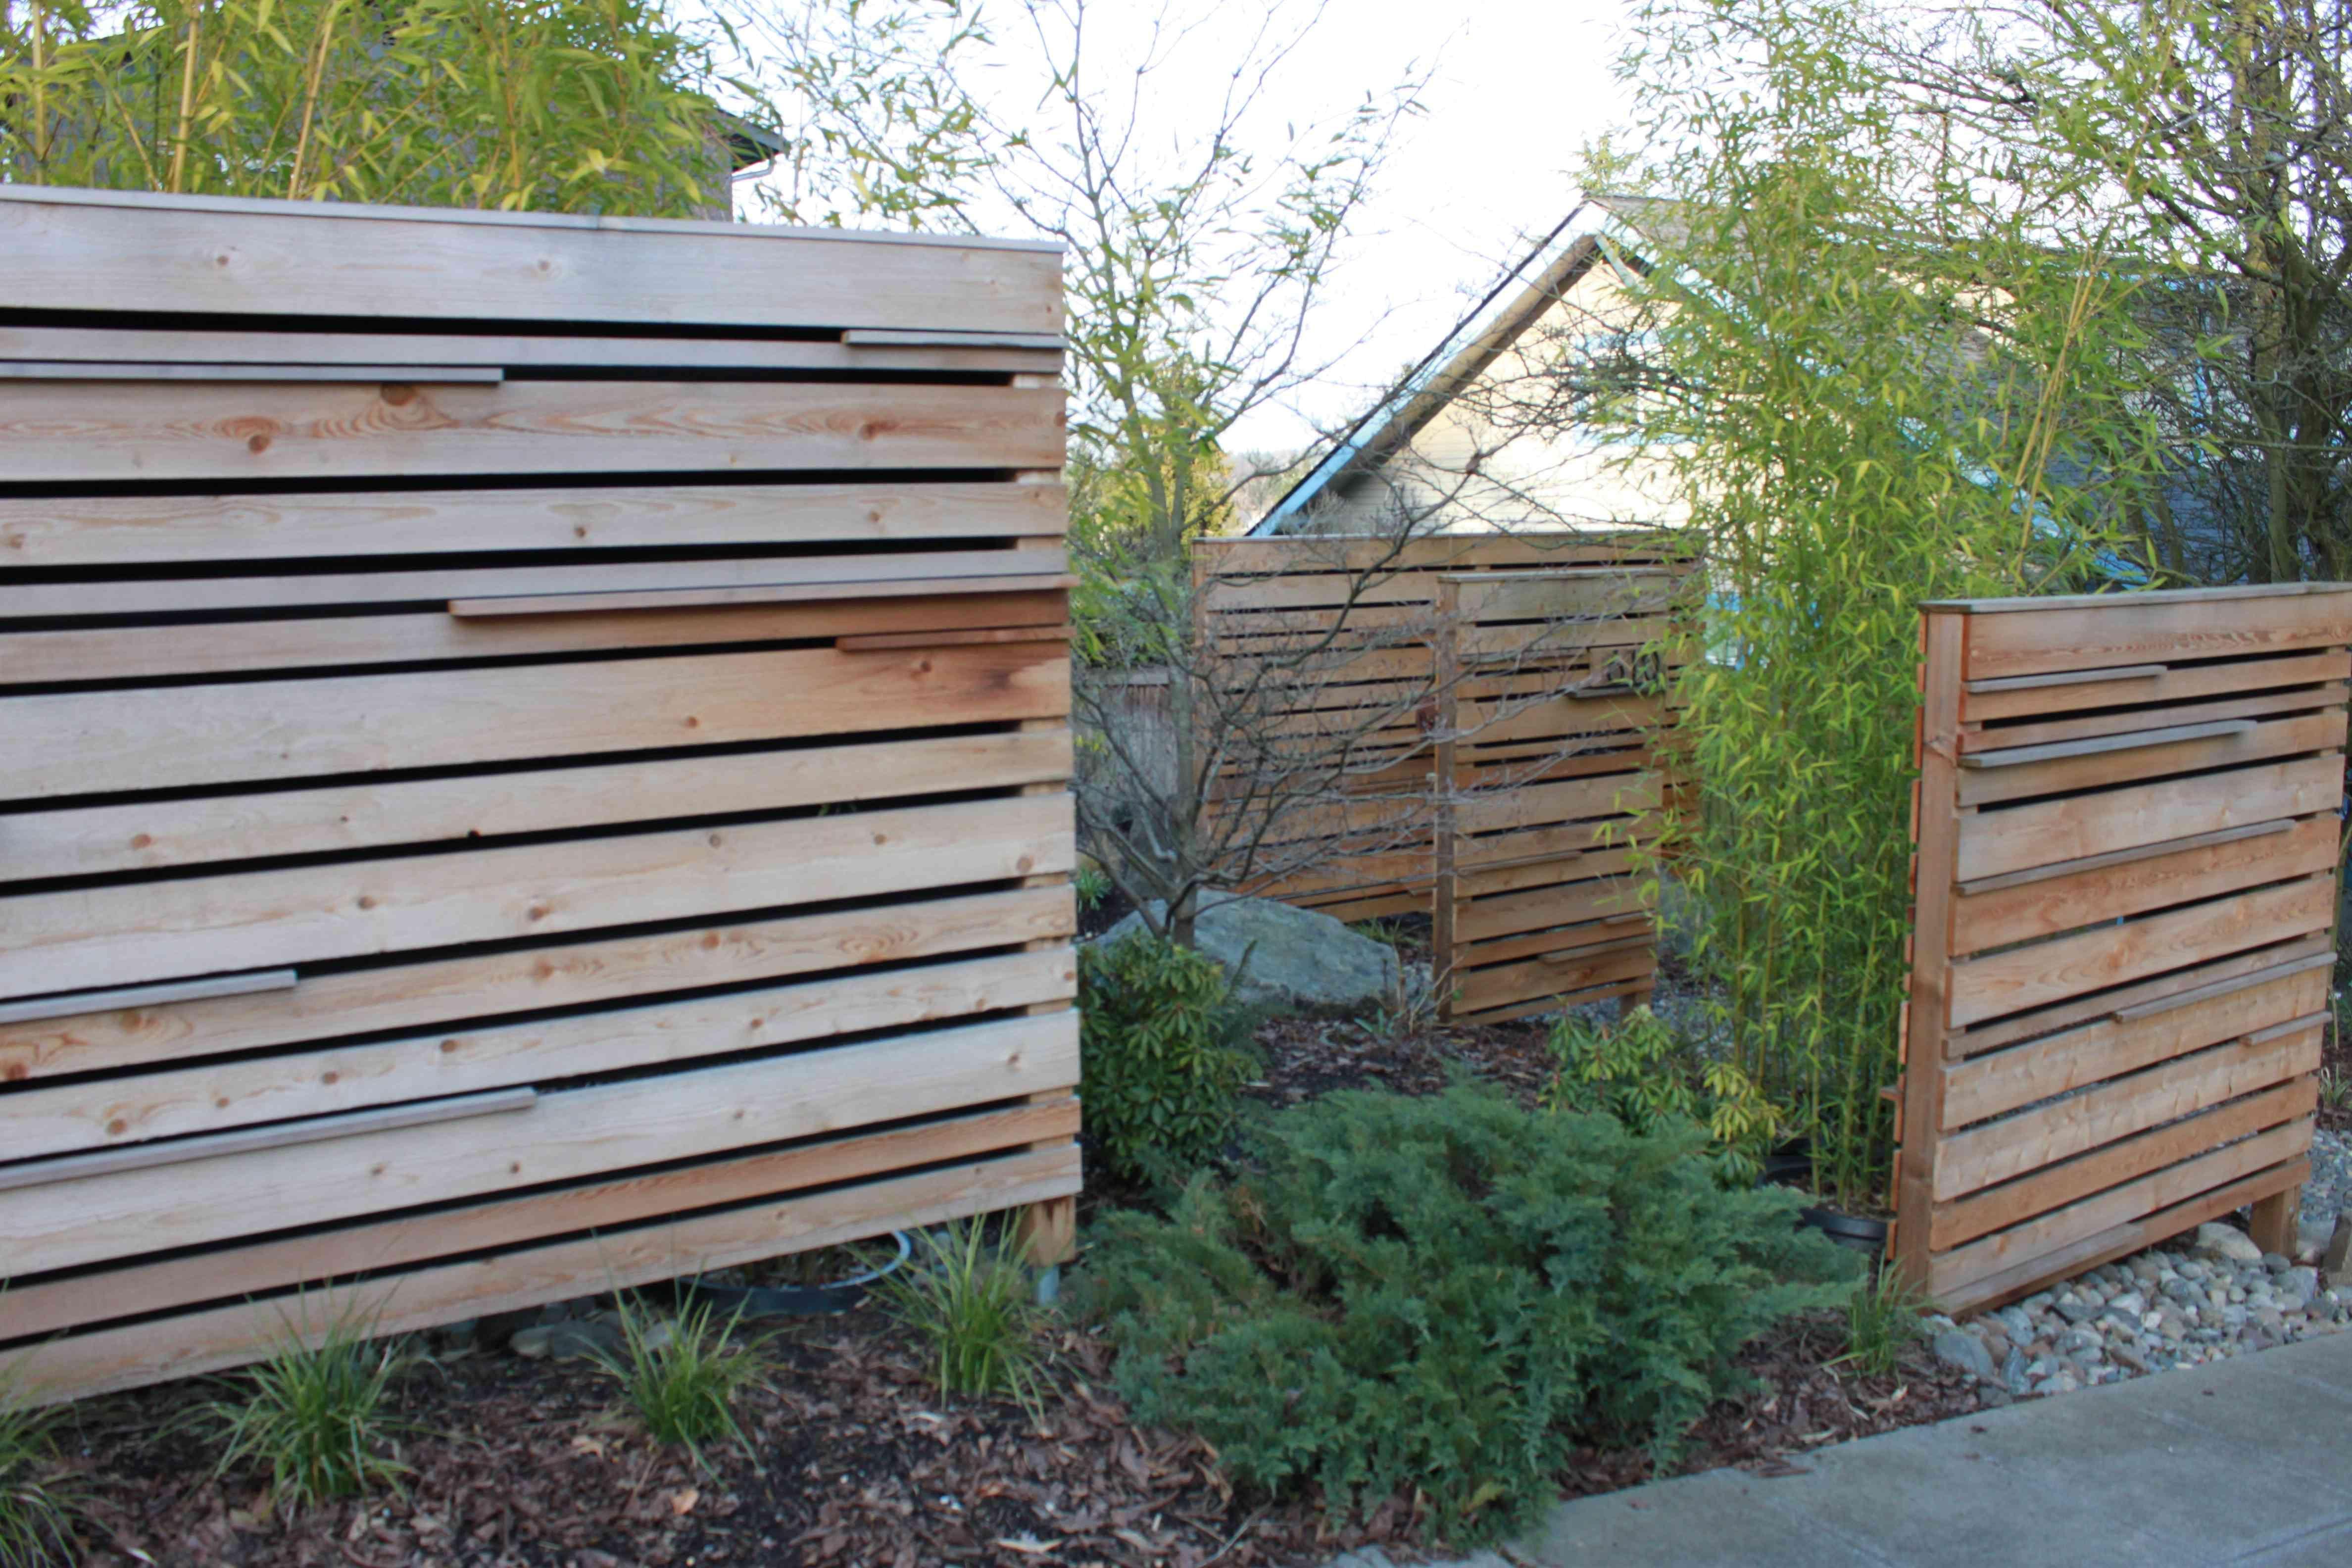 fence design horizontal fence yards and backyard. Black Bedroom Furniture Sets. Home Design Ideas